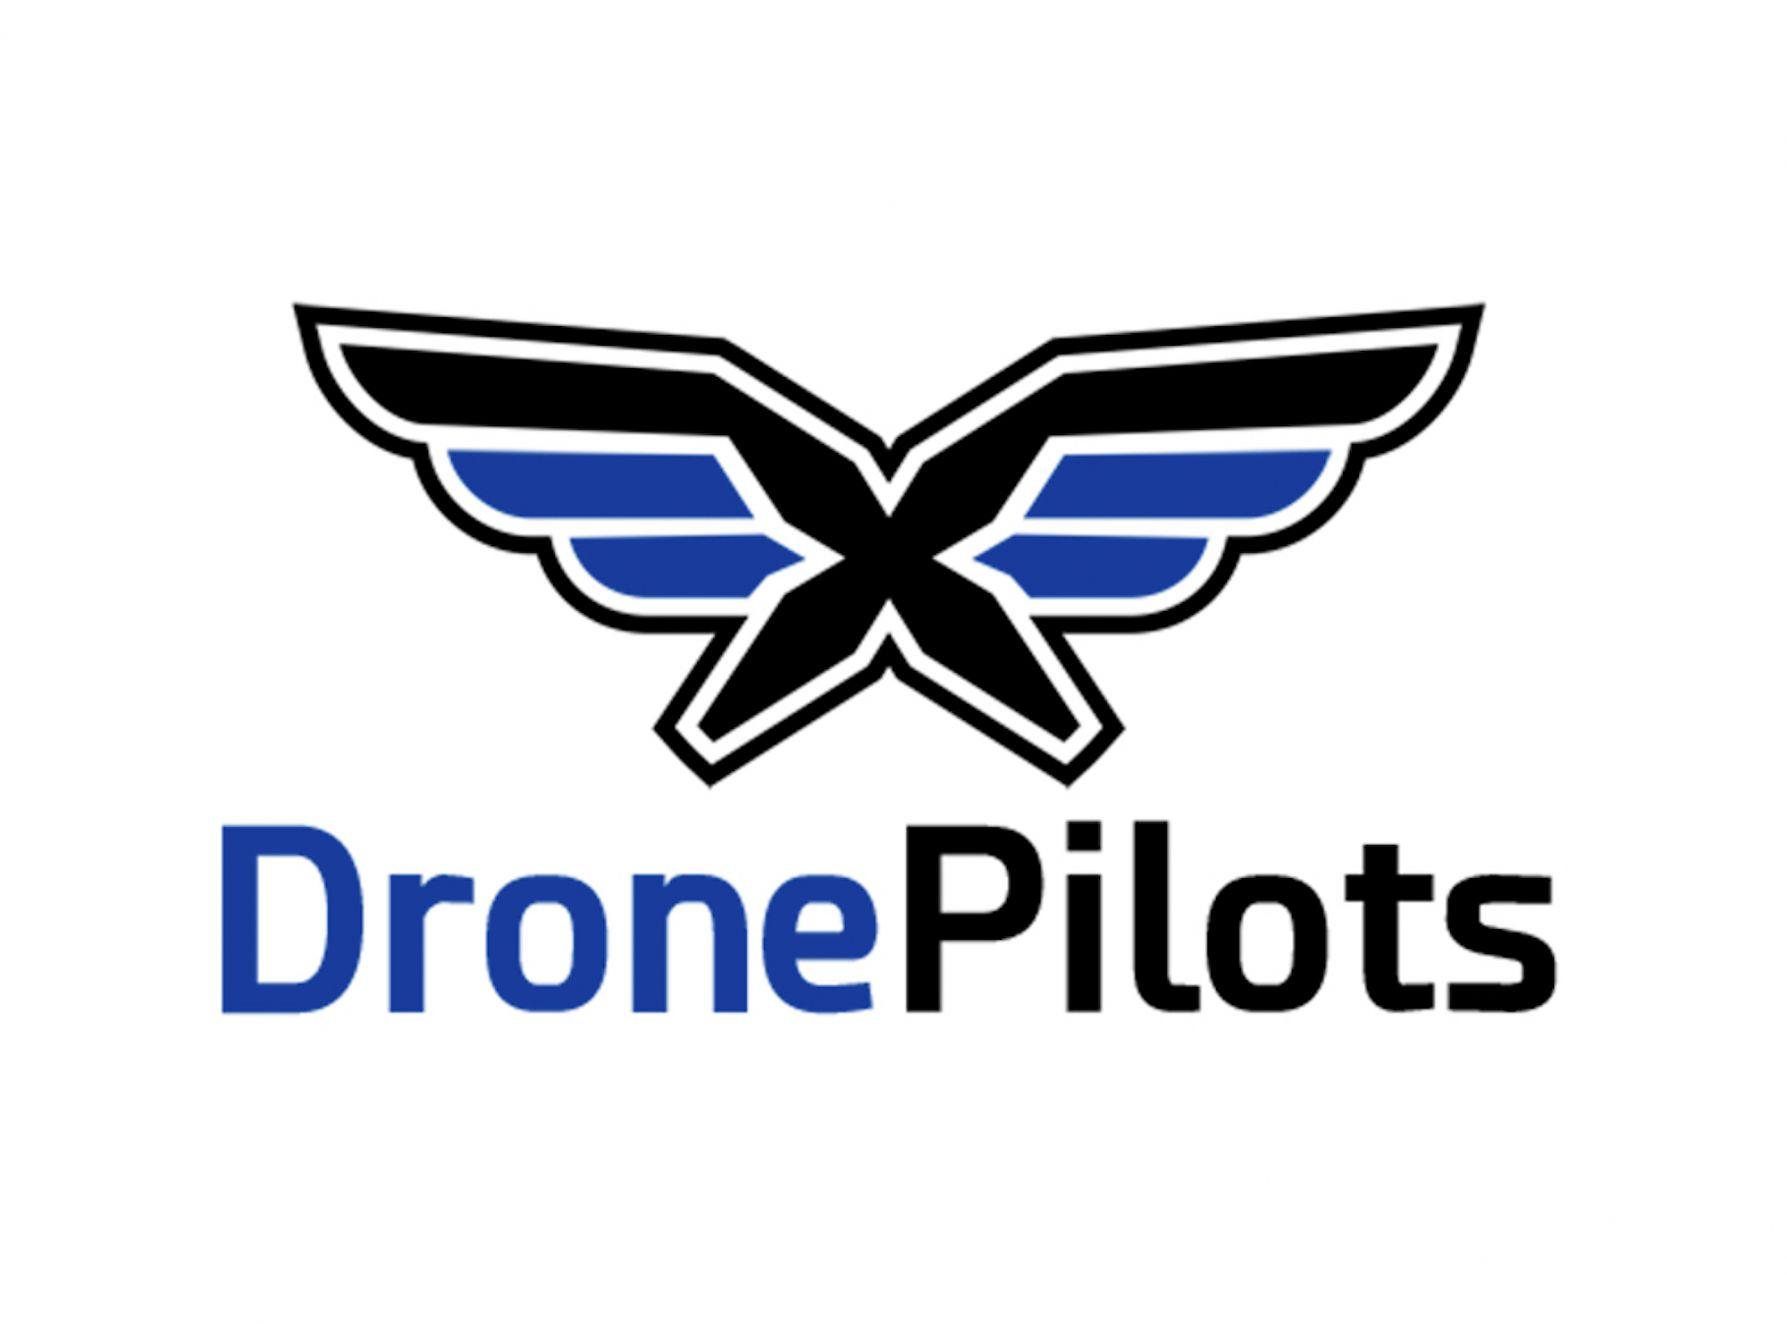 DronePilots Network Logo